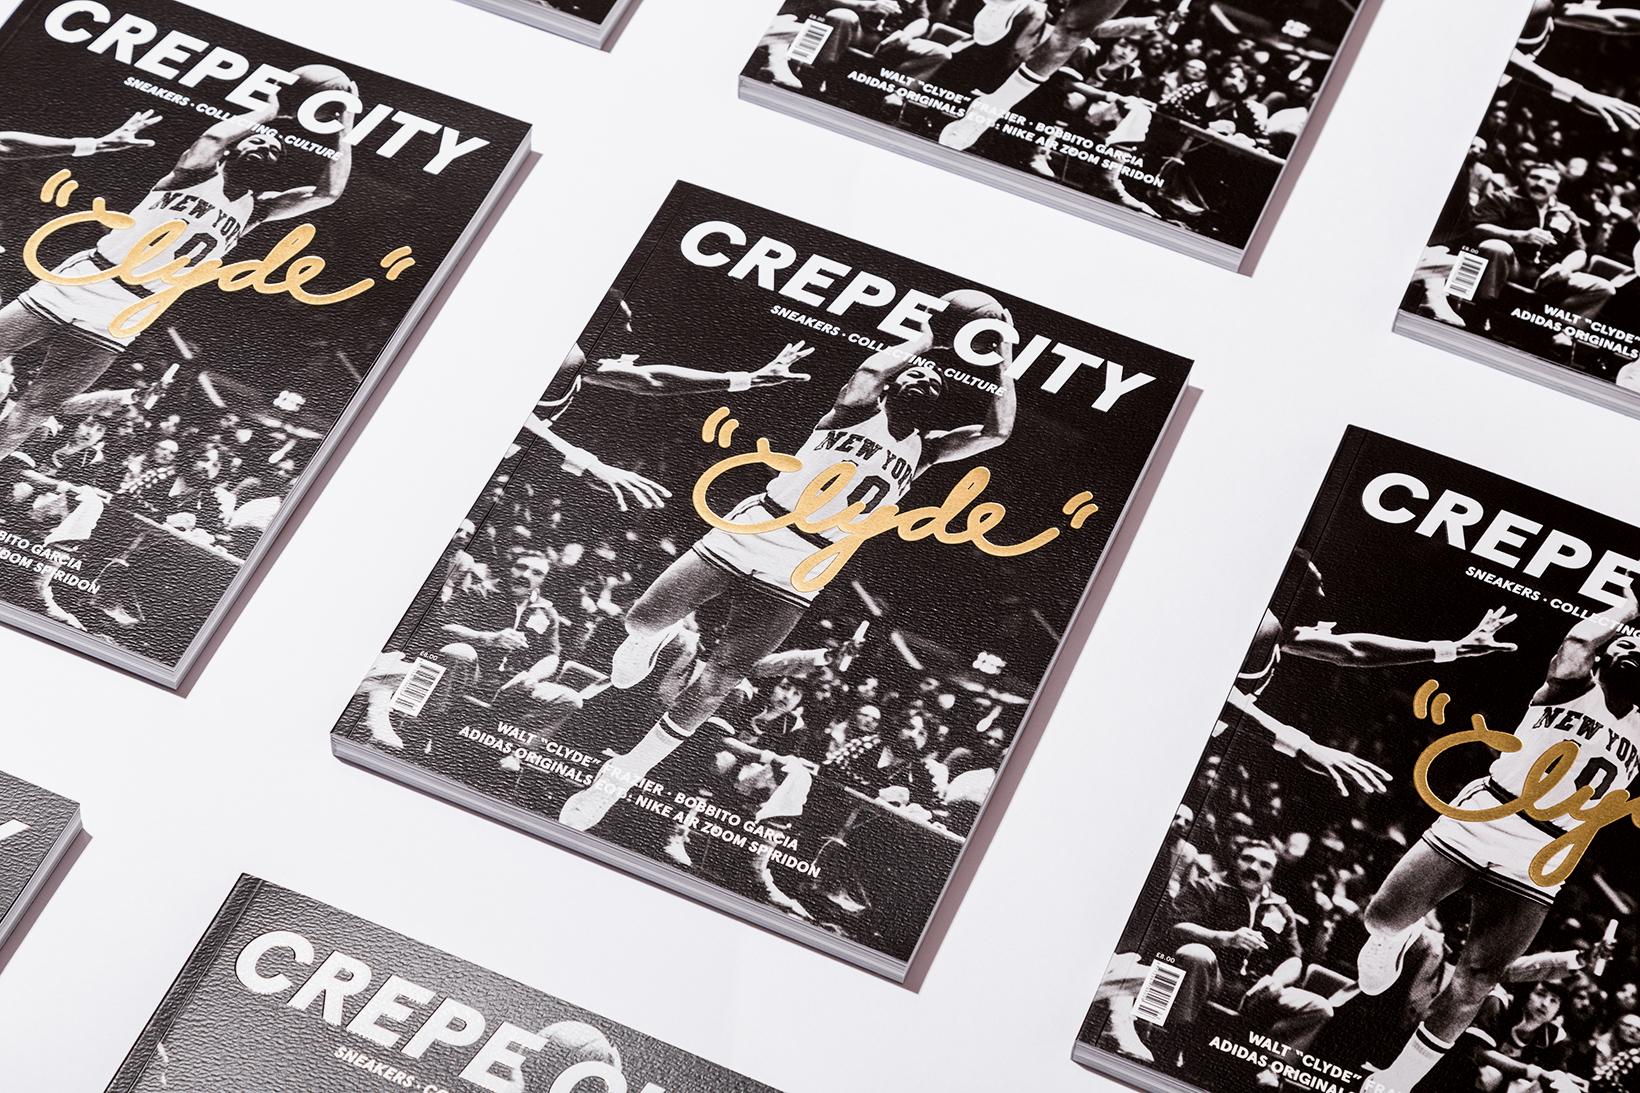 CREPE CITY Magazine Issue 03 - 1779443